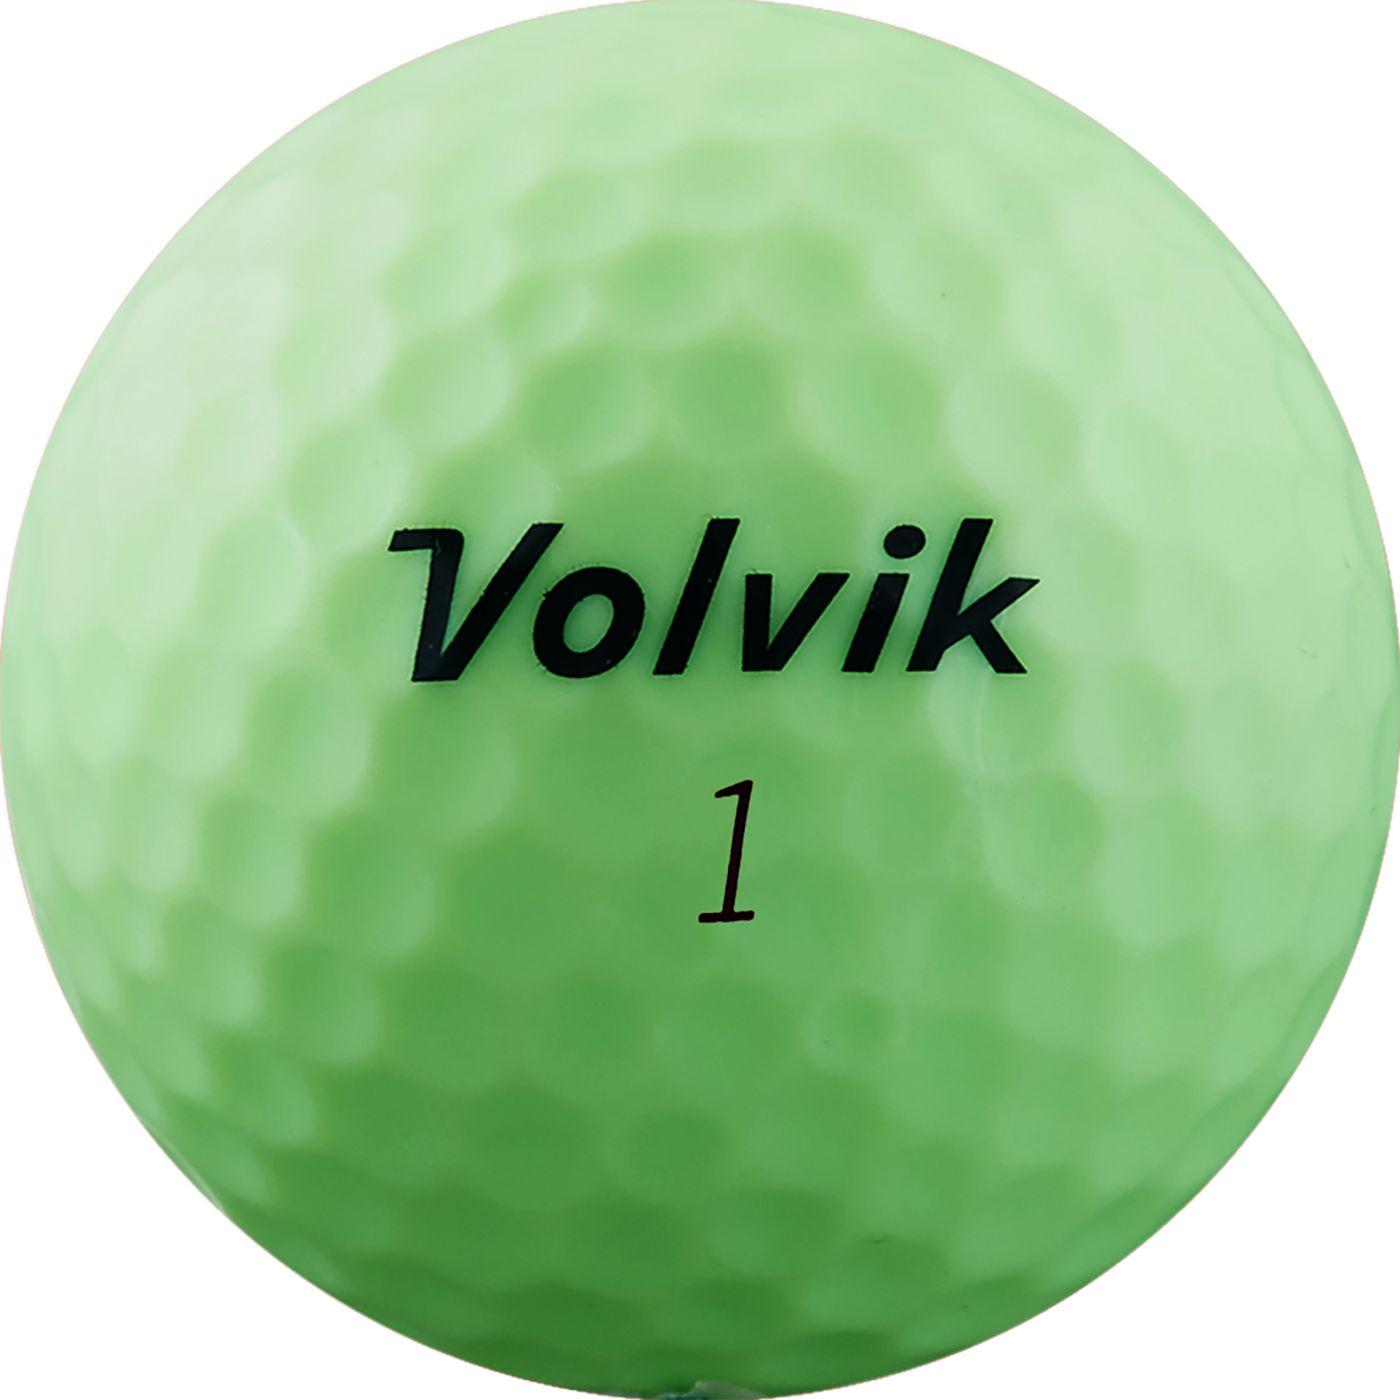 Volvik 2019 ViMAX Soft Green Golf Balls